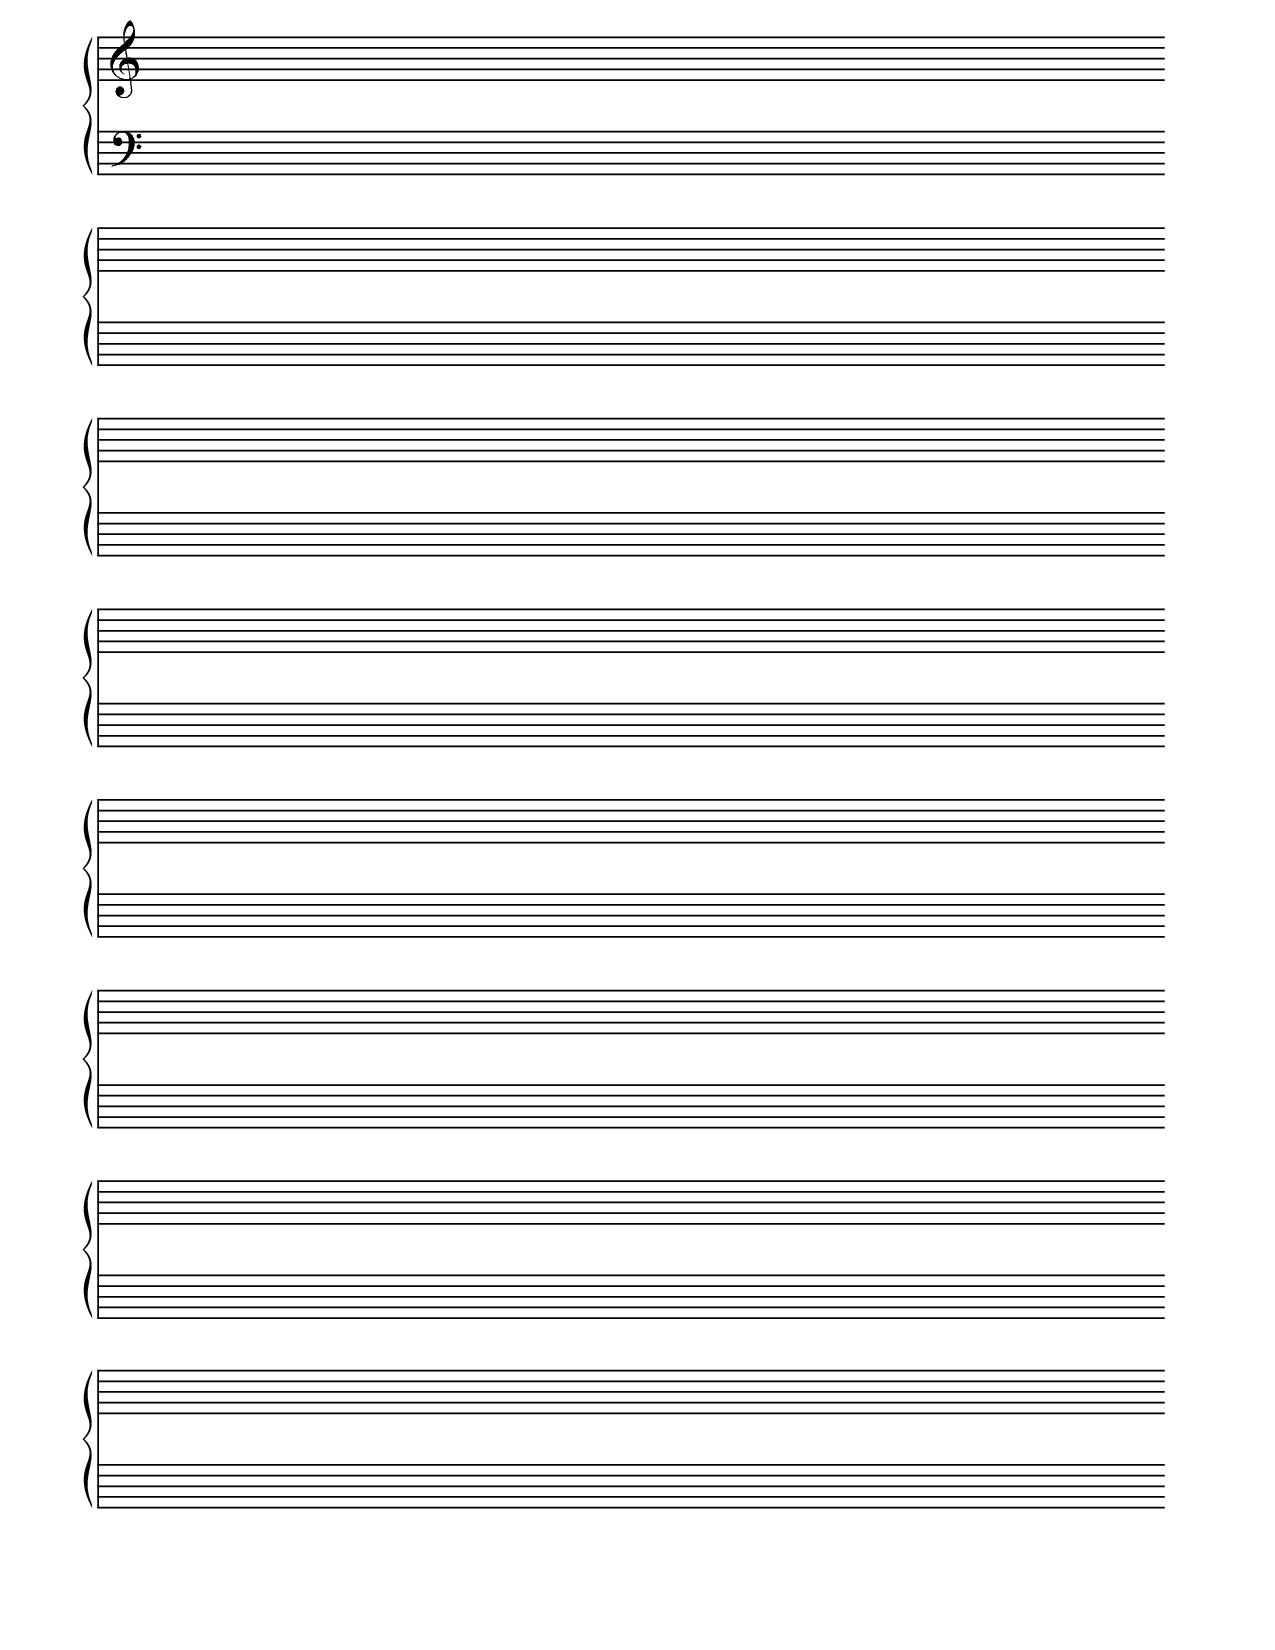 Printable Blank Piano Sheet Music Paper | Print In 2019 | Blank - Free Printable Staff Paper Blank Sheet Music Net